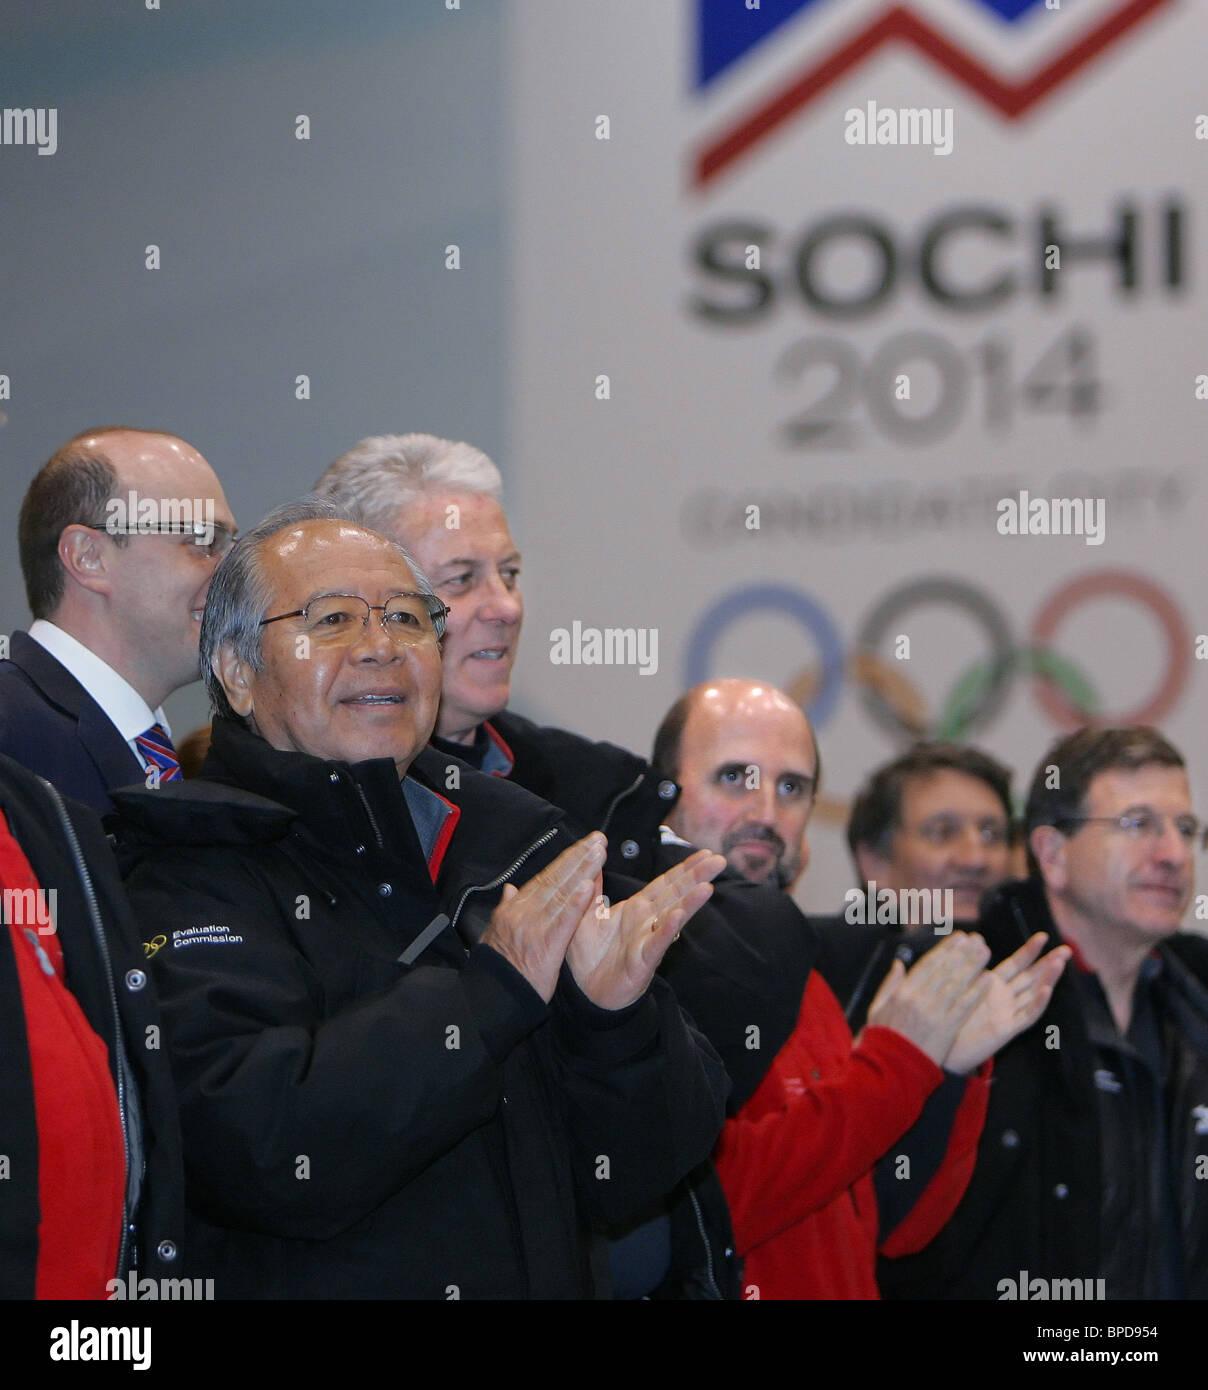 IOC Evaluation team arrive in Sochi - Stock Image